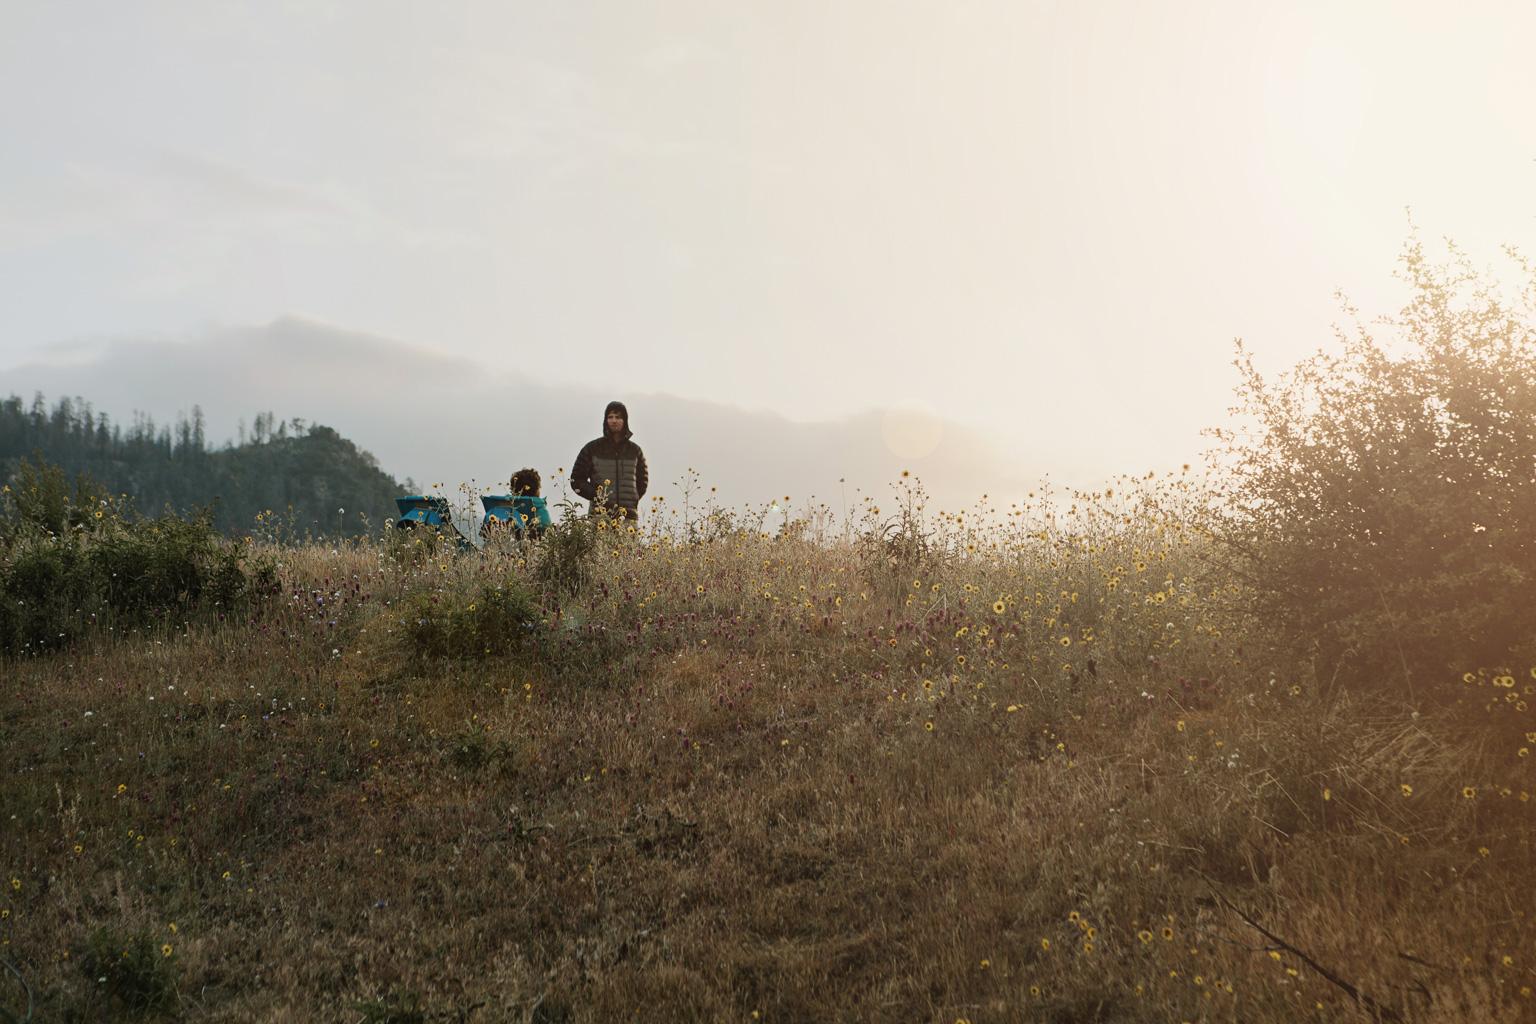 CindyGiovagnoli_Kings_Canyon_National_Park_hike_firetower_lookout_sunset-015.jpg